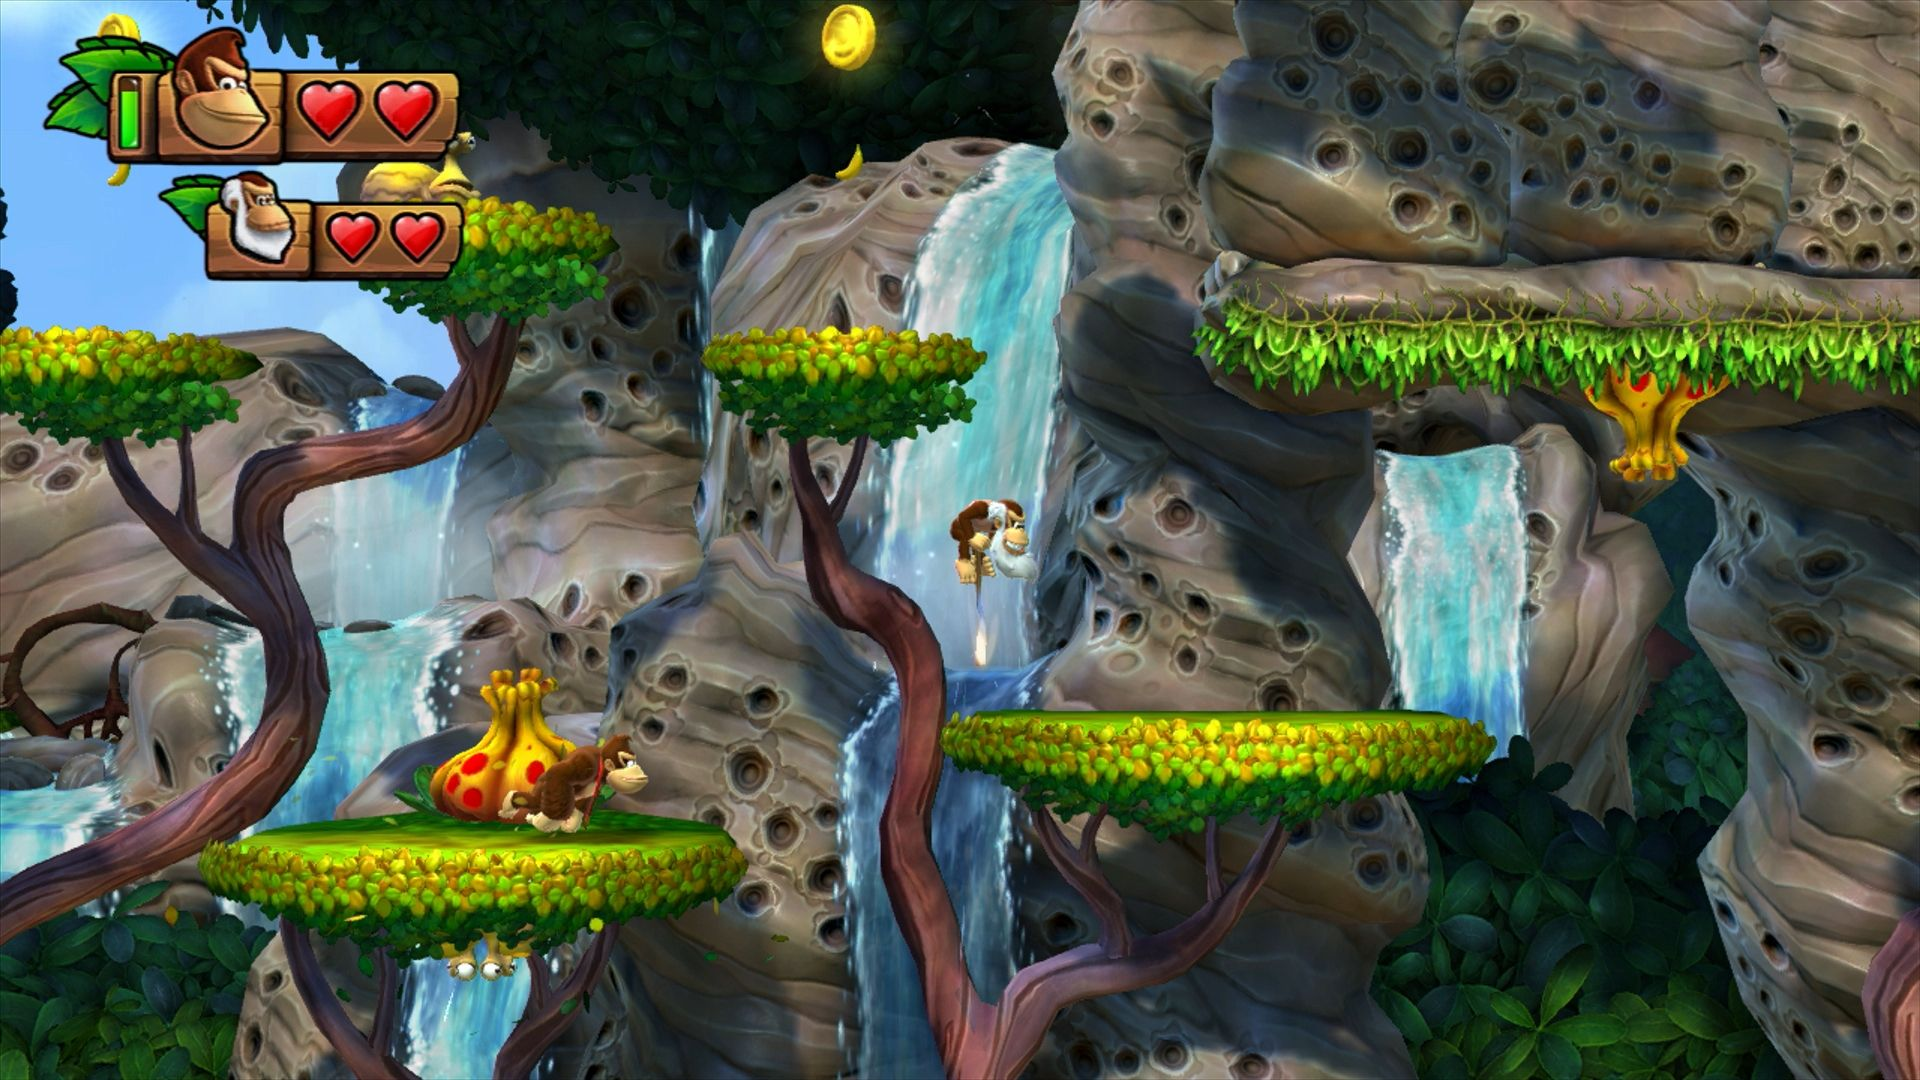 Donkey Kong Tropical Freeze Google Search Donkey Kong Country